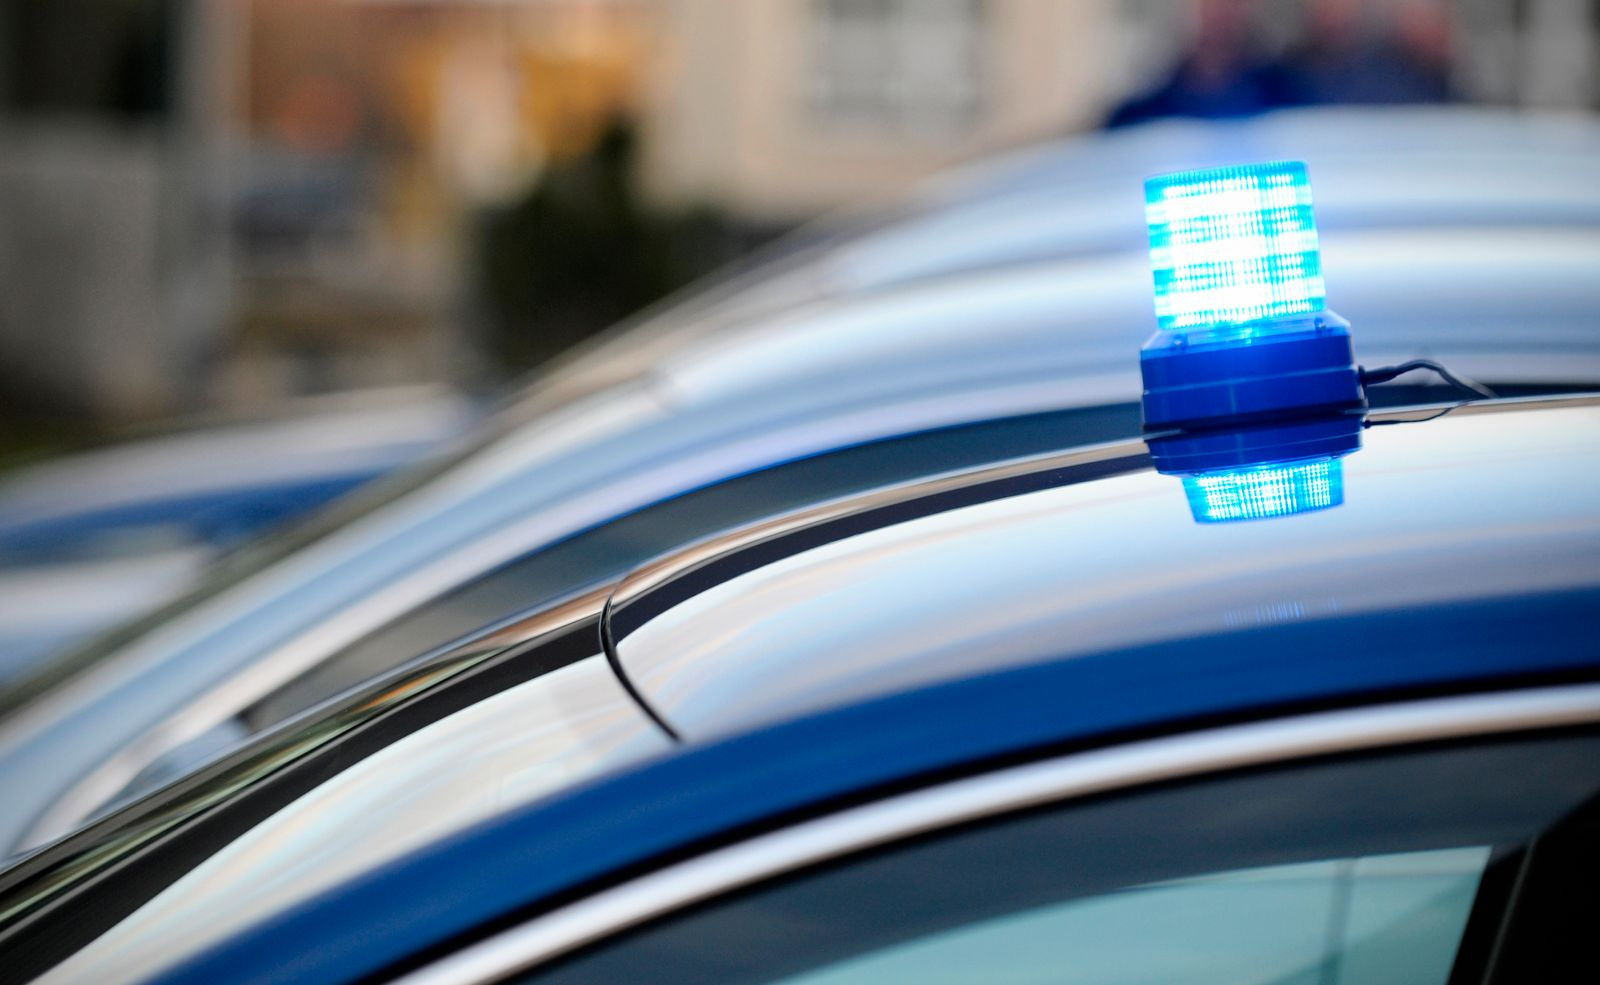 Blue emergency vehicle lighting, beacon